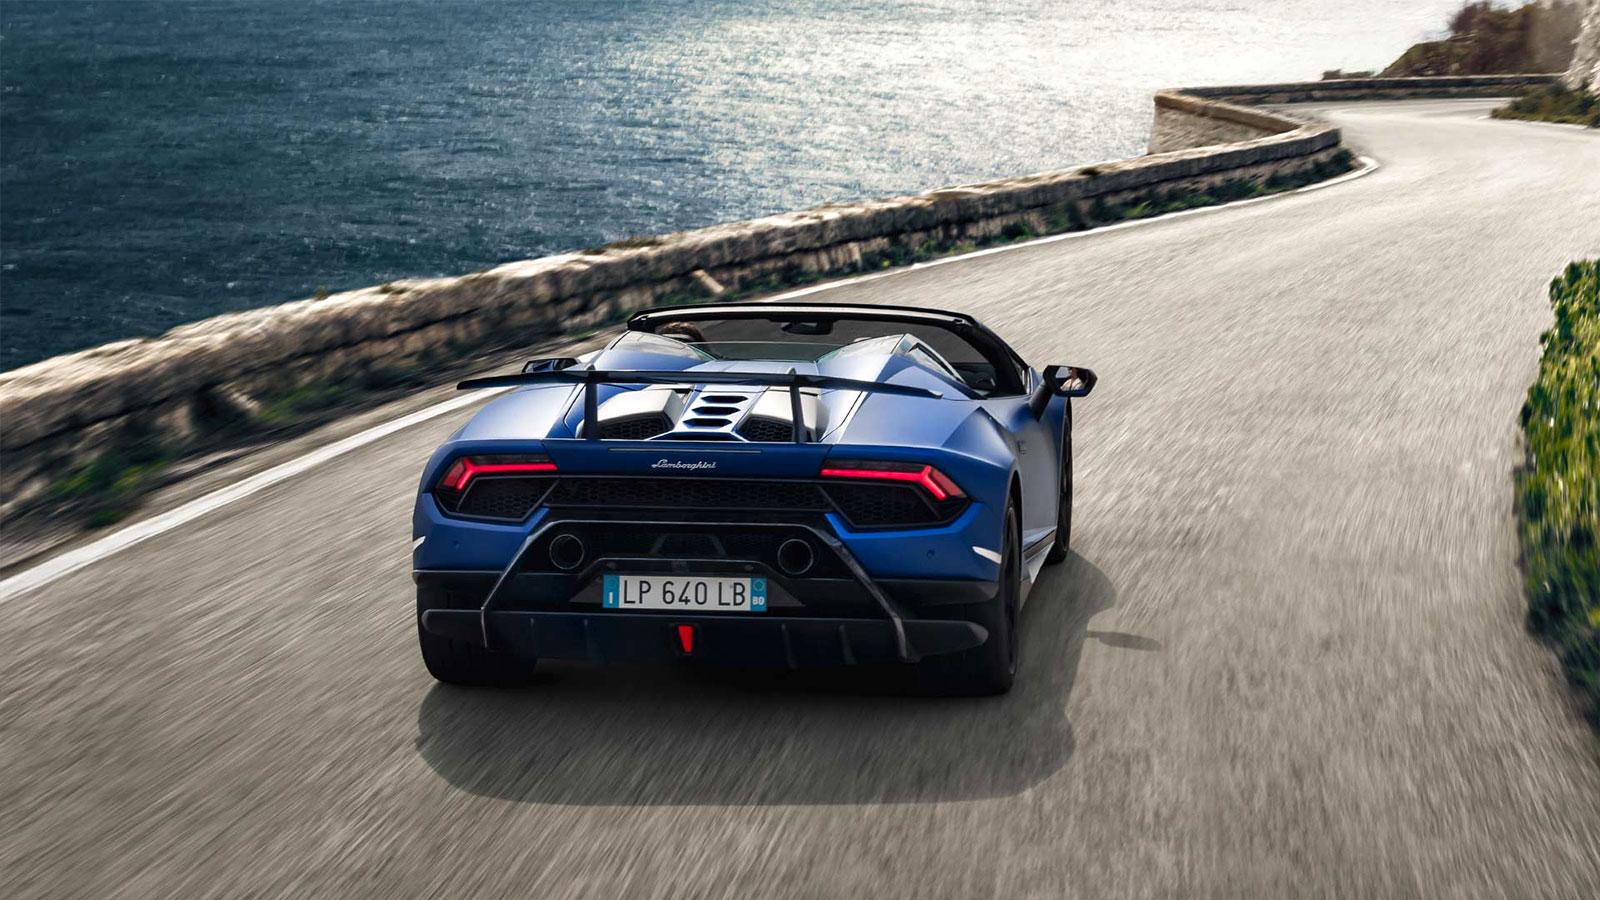 Lamborghini Huracan Performante Spyder - Vivid Technology image 8